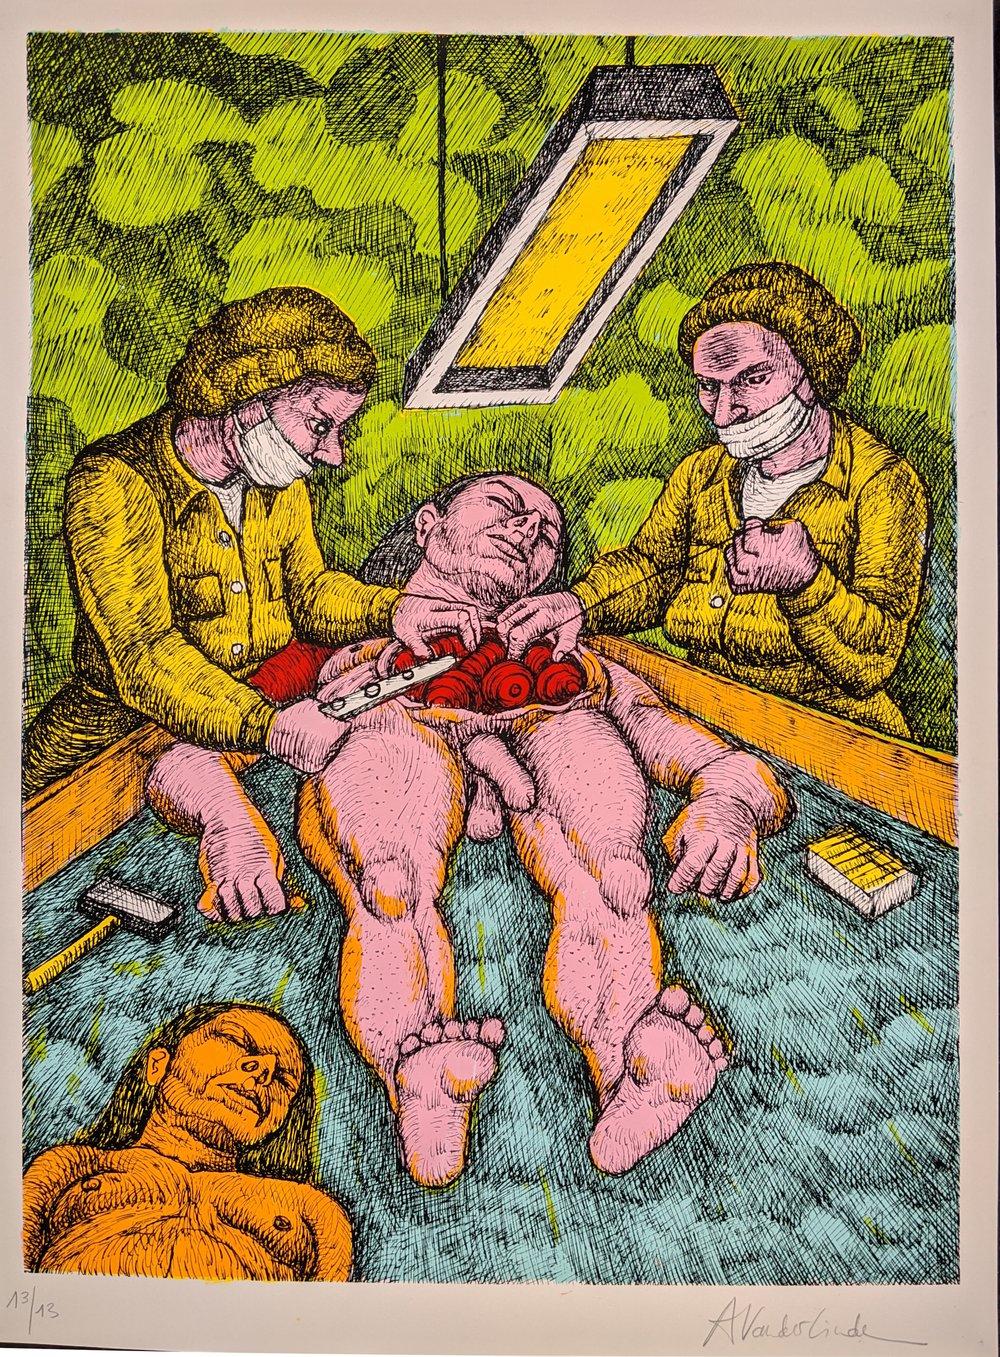 Image of Surgery -Print by Anne Van der Linden